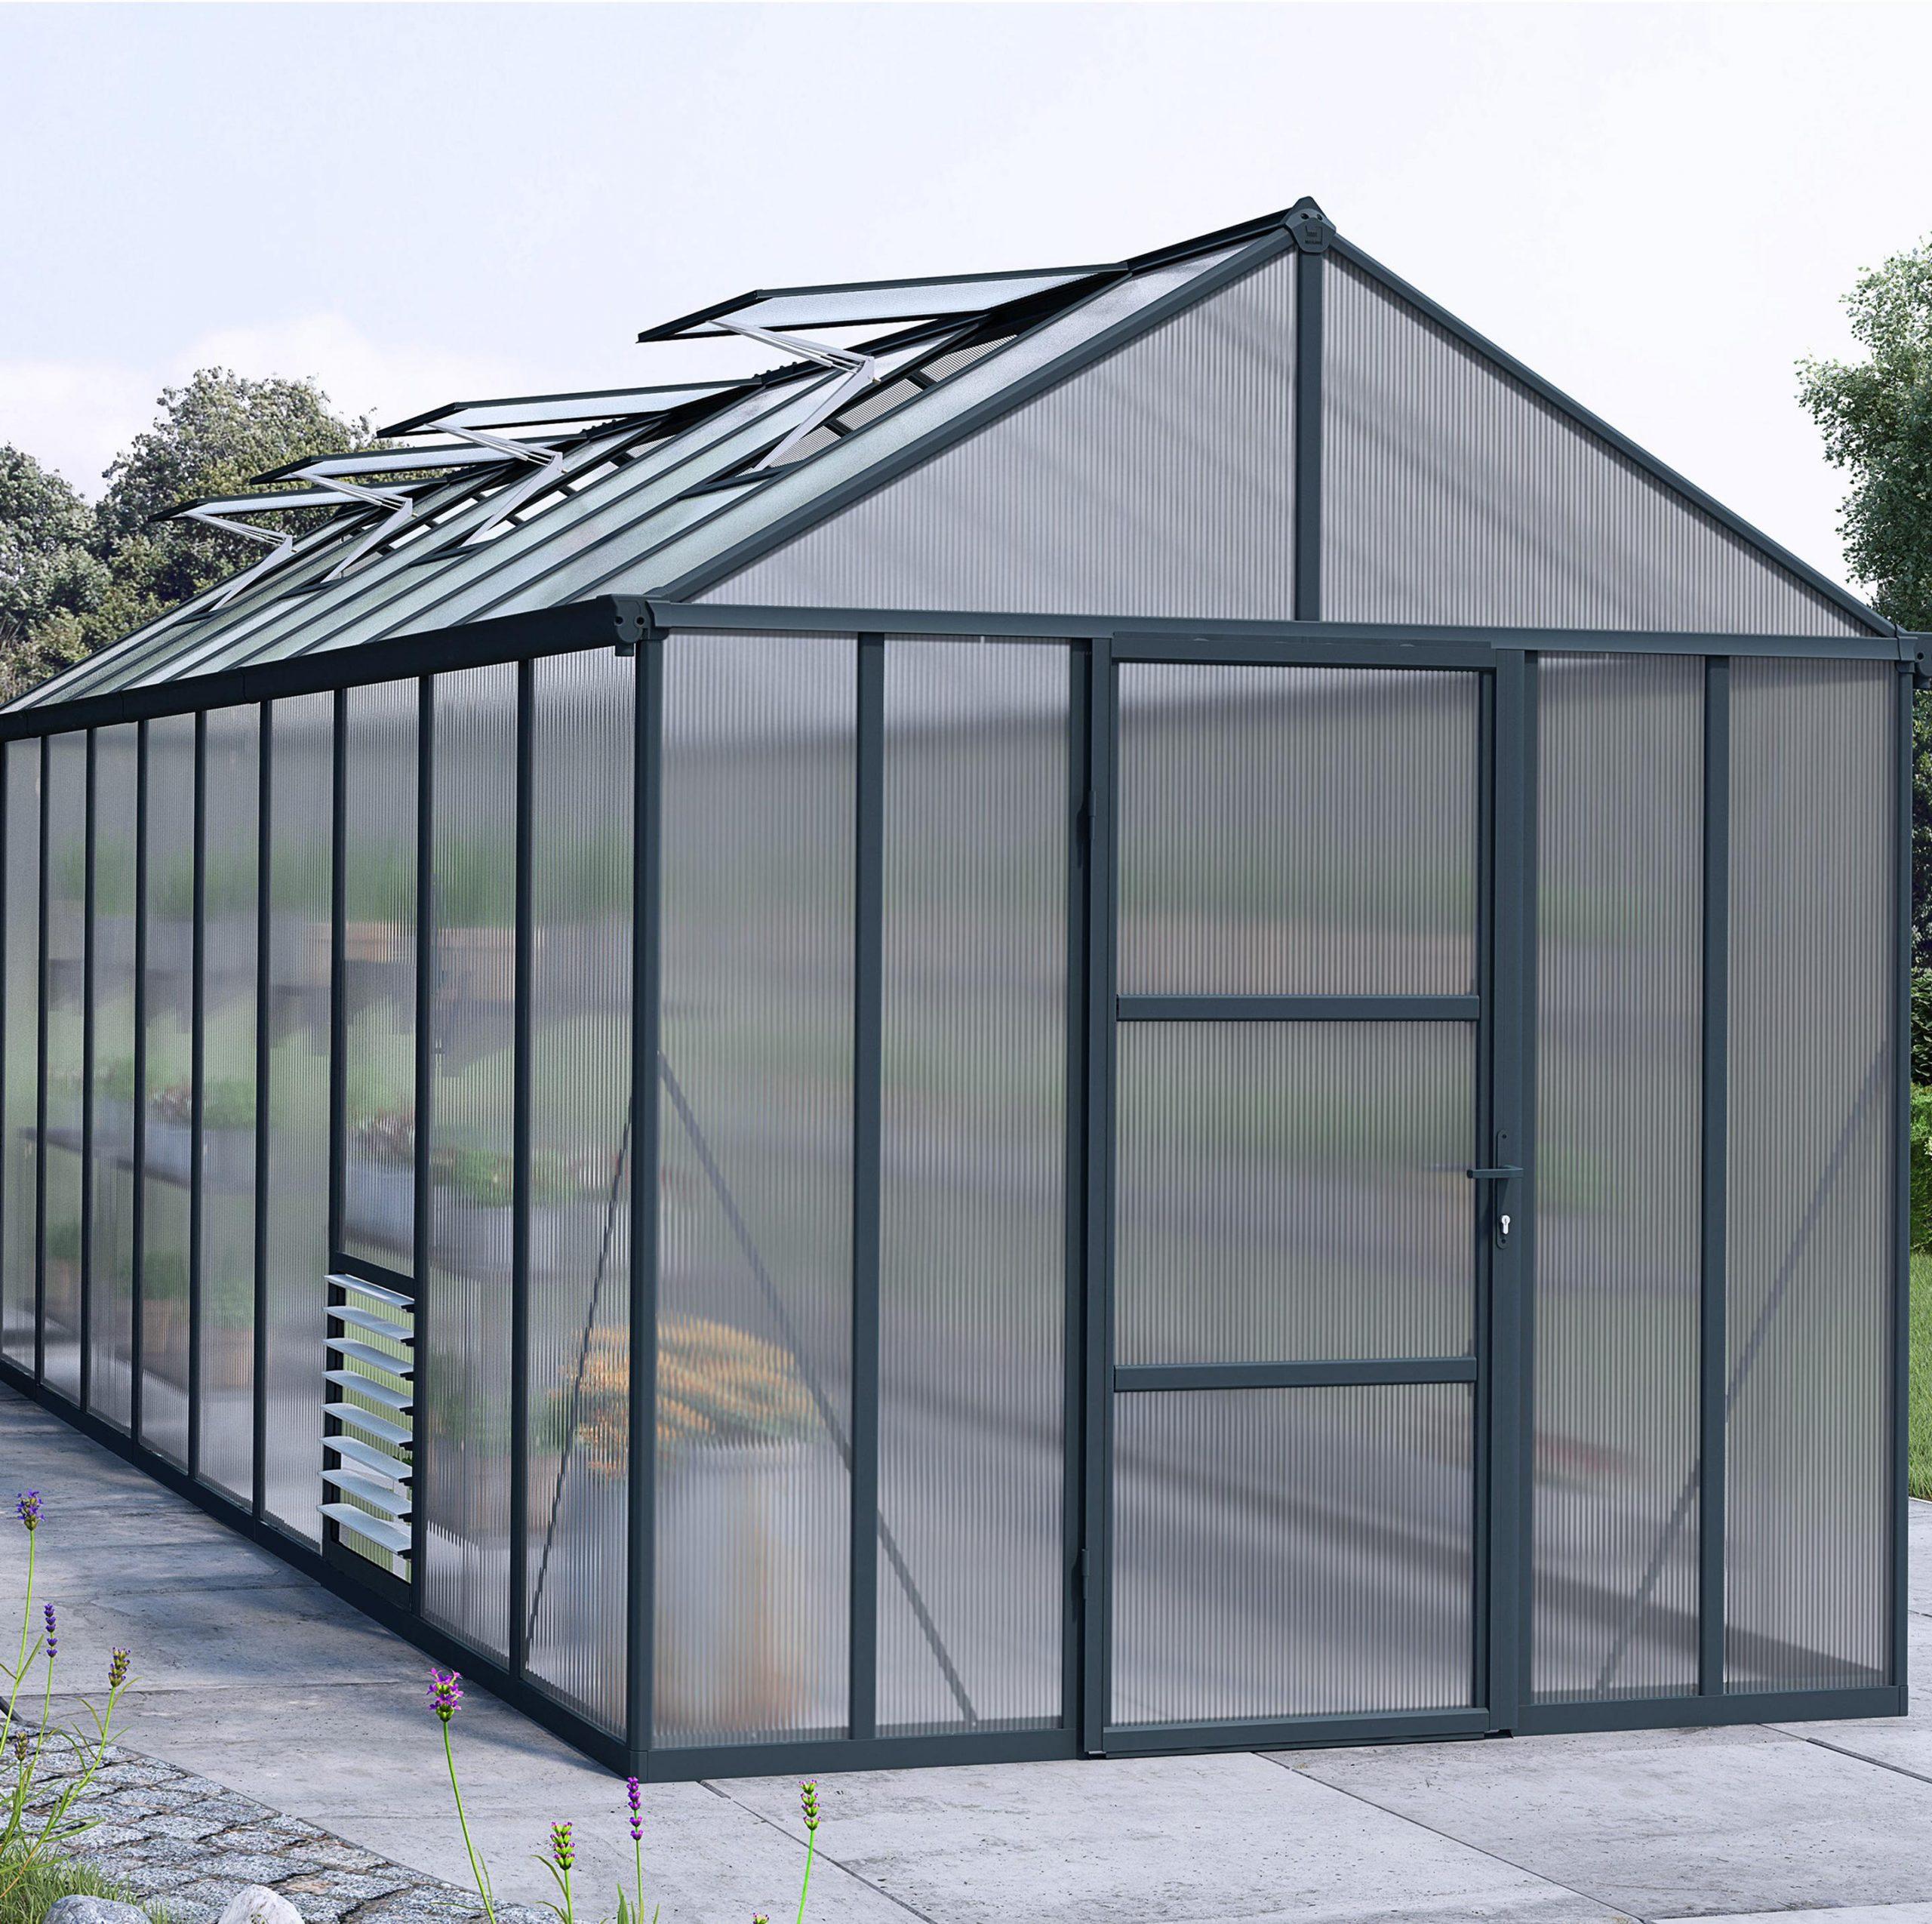 Serre De Jardin Glory 14.3 M², Aluminium Et Polycarbonate Double Parois,  Palram pour Serres De Jardin Leroy Merlin